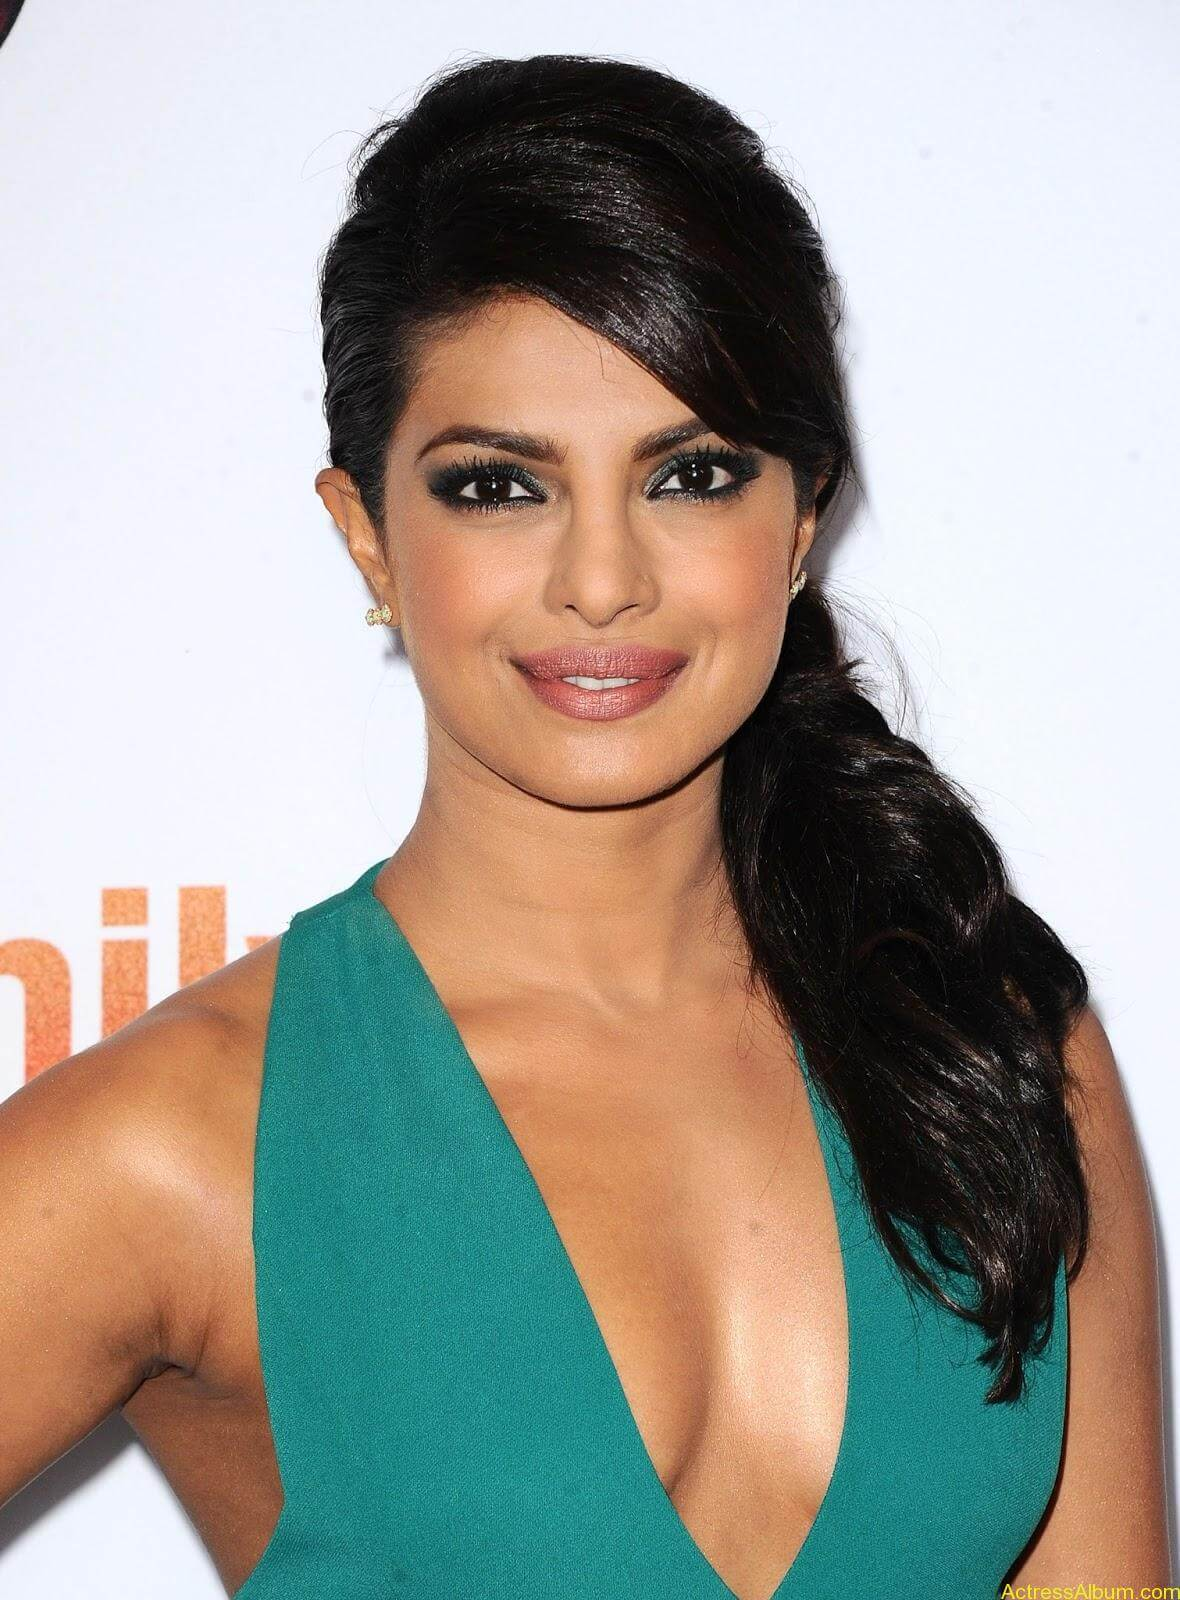 Priyanka-Chopra-Latest-Hot-Cleavage-Photos-Stills-6